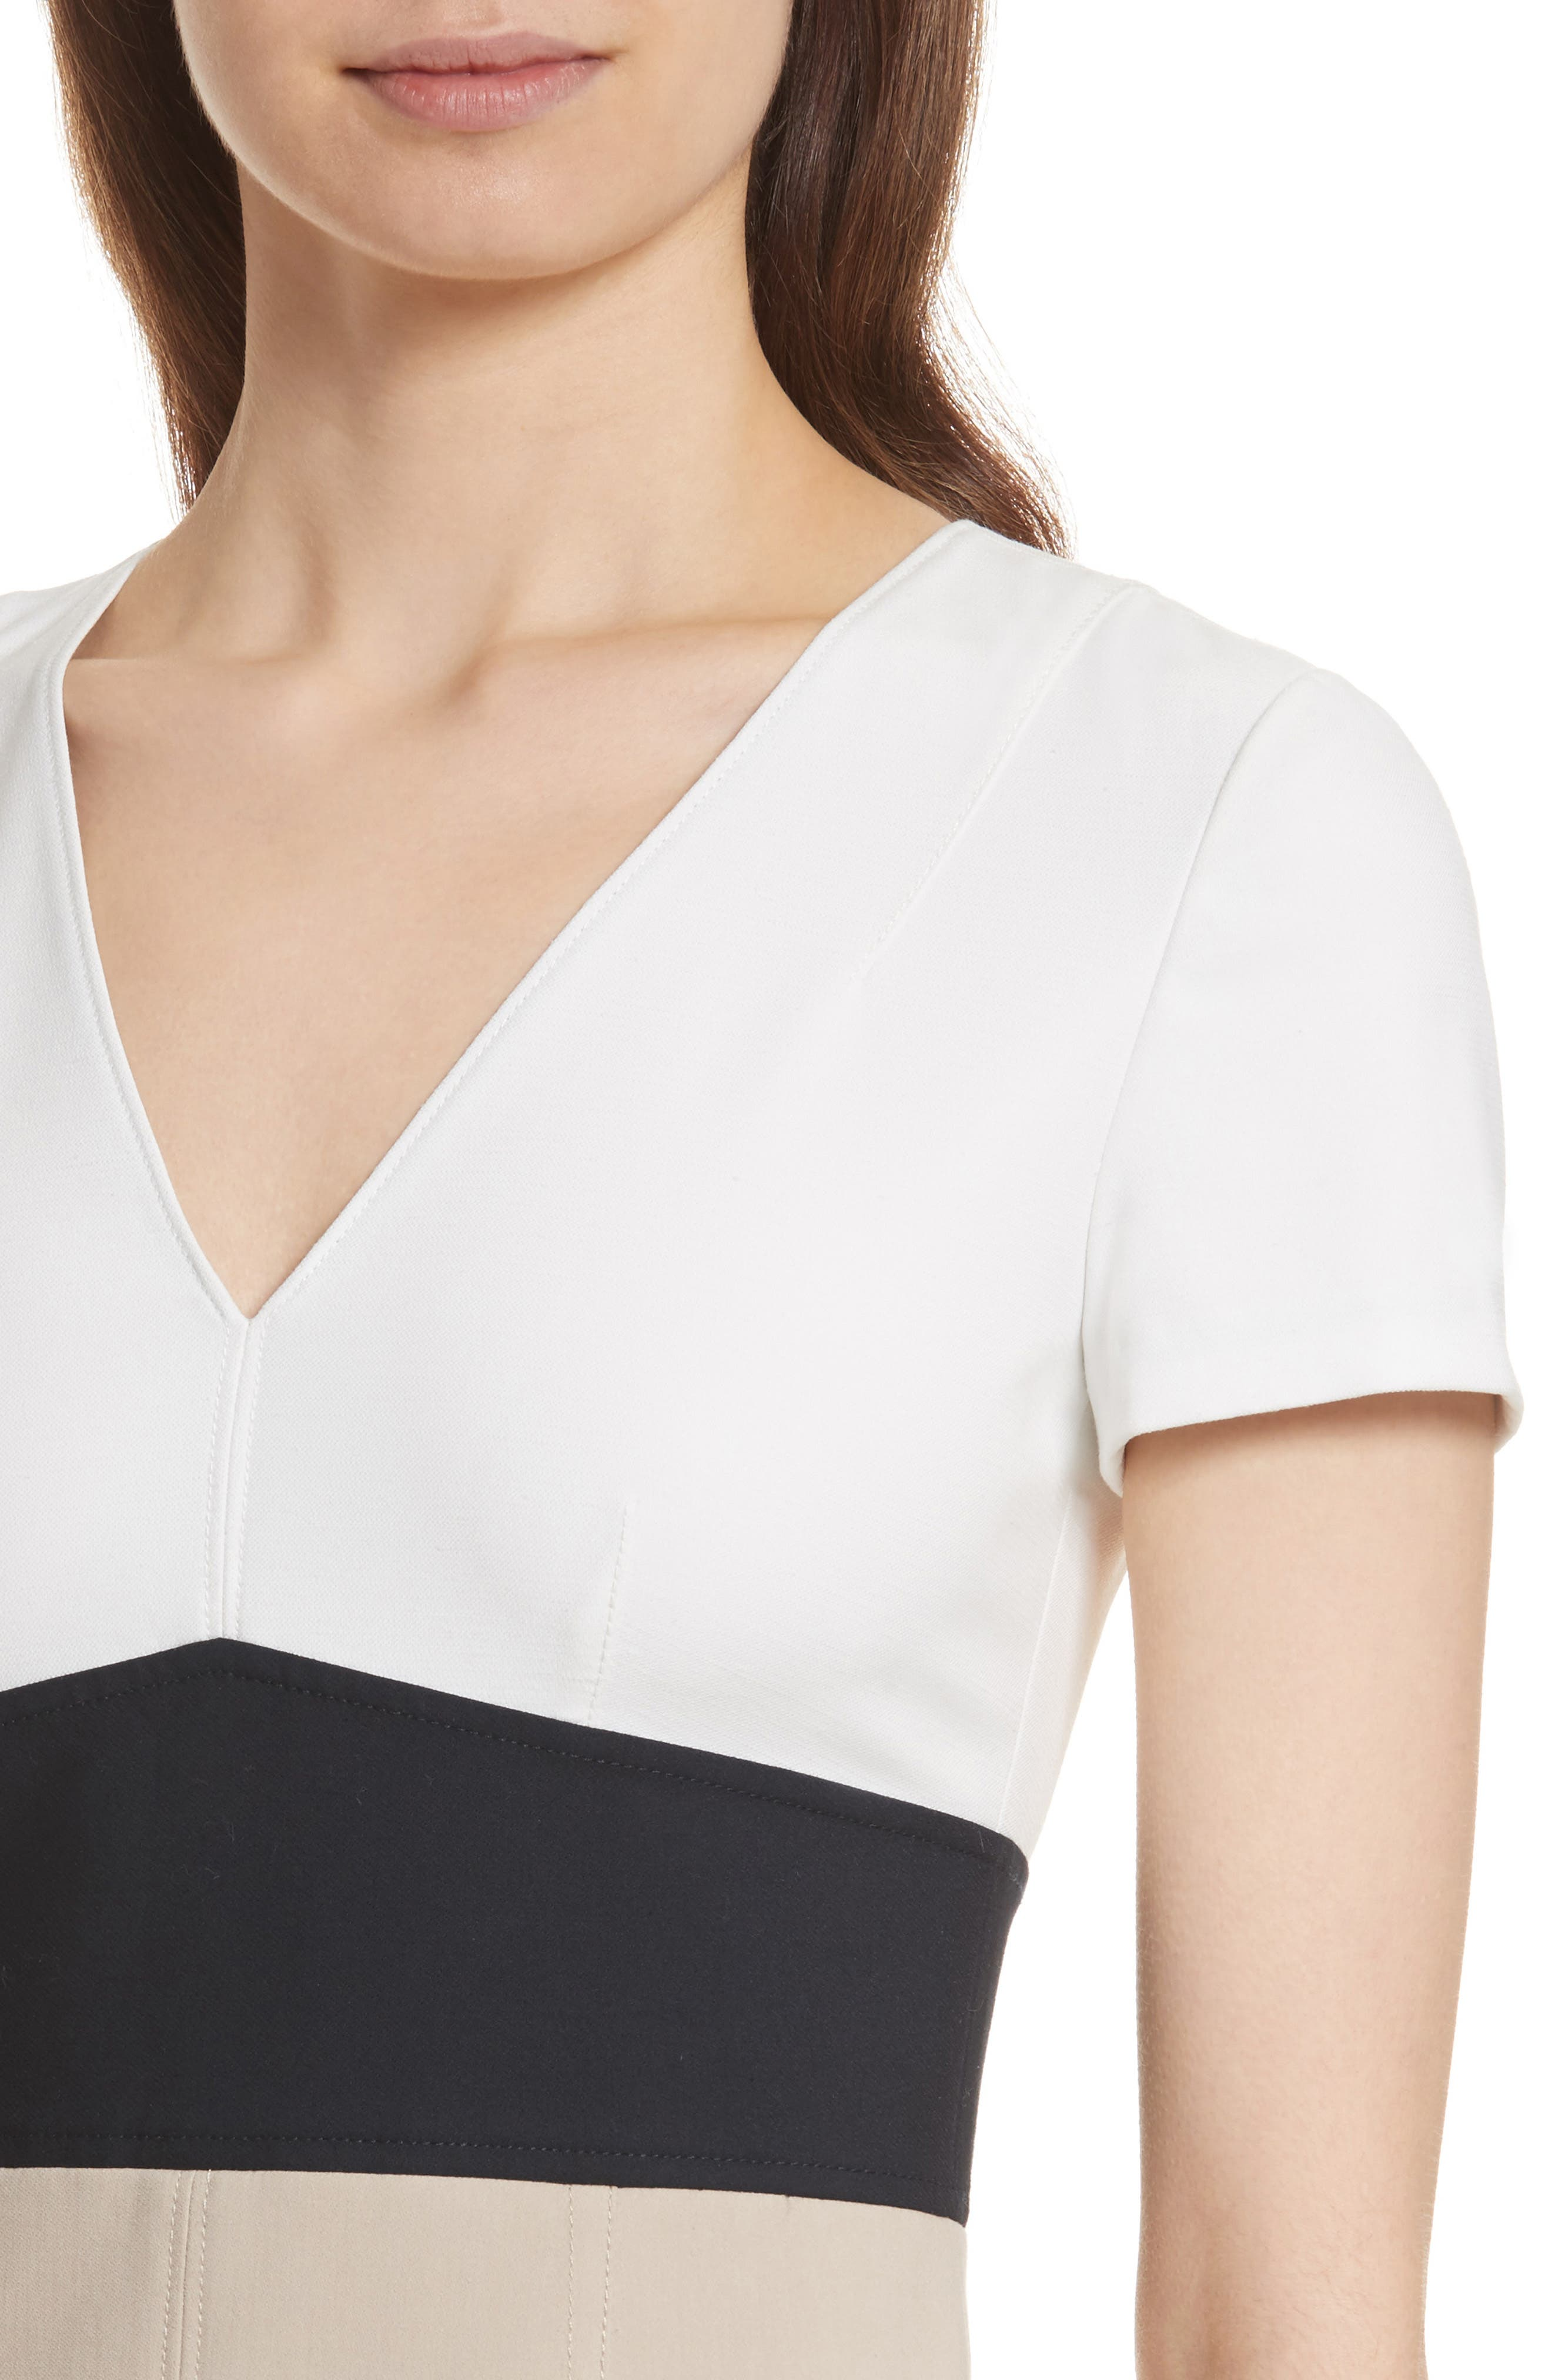 Diane von Furstenberg Colorblock Stretch Cotton Blend Sheath Dress,                             Alternate thumbnail 4, color,